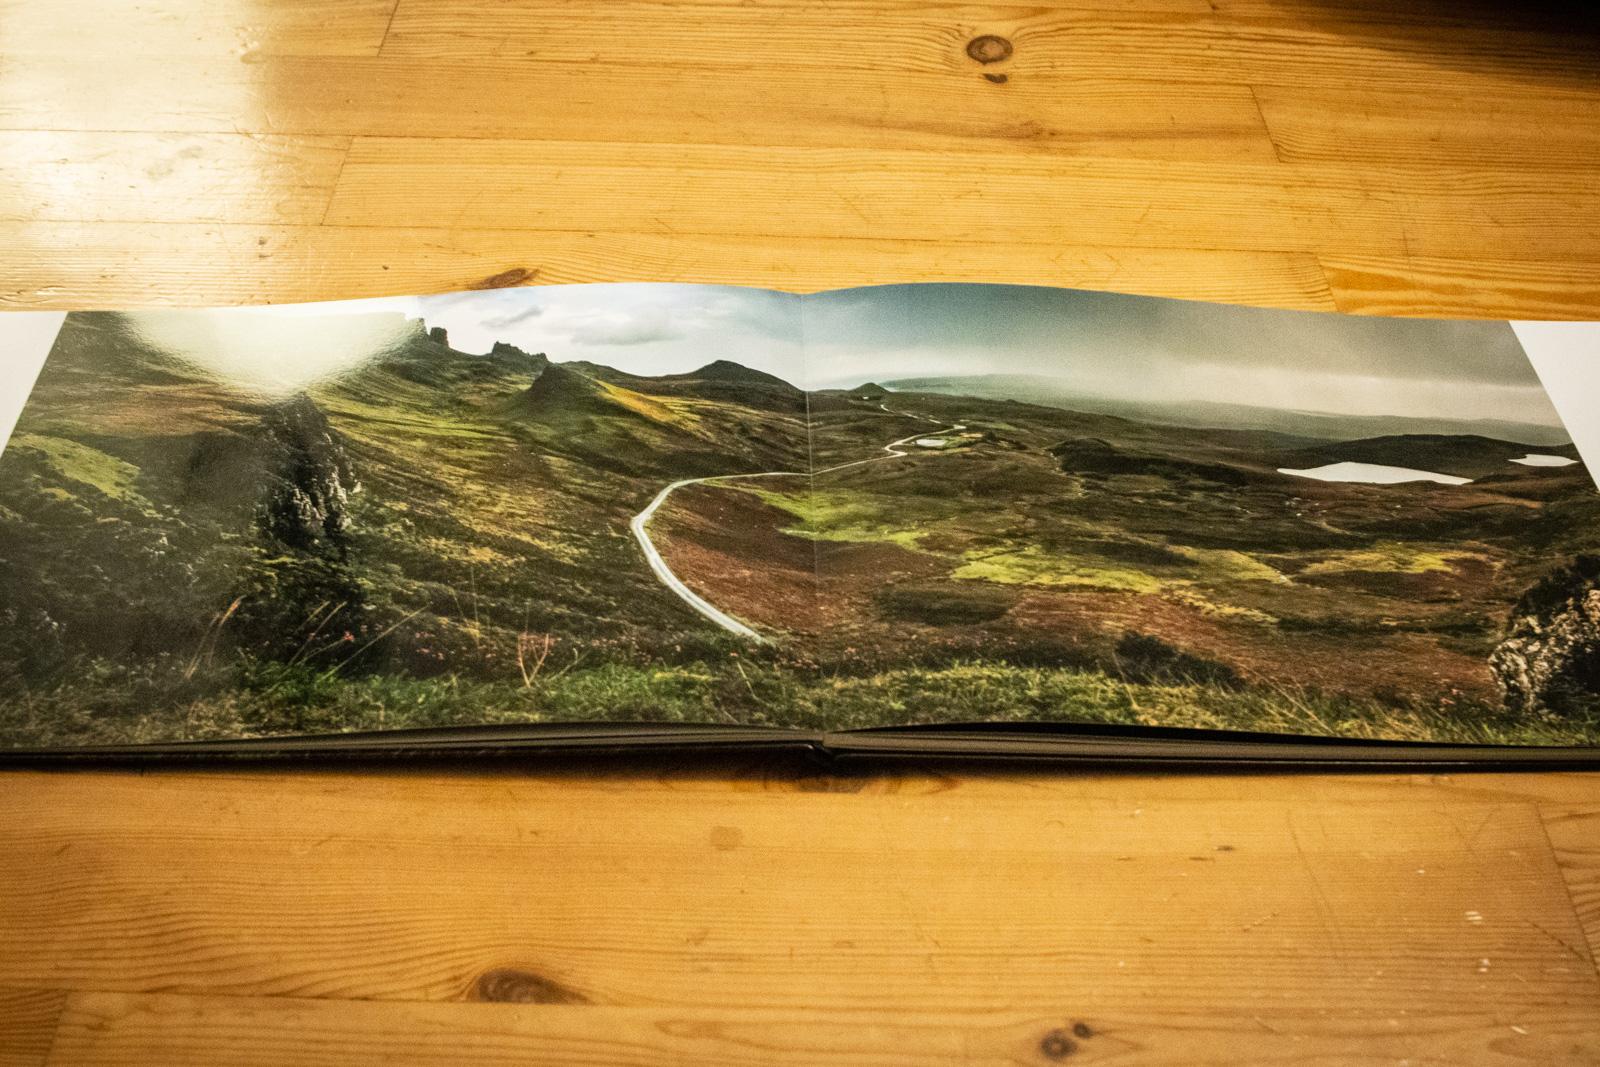 Layflat-Bindung: Perfekt für Panoramen